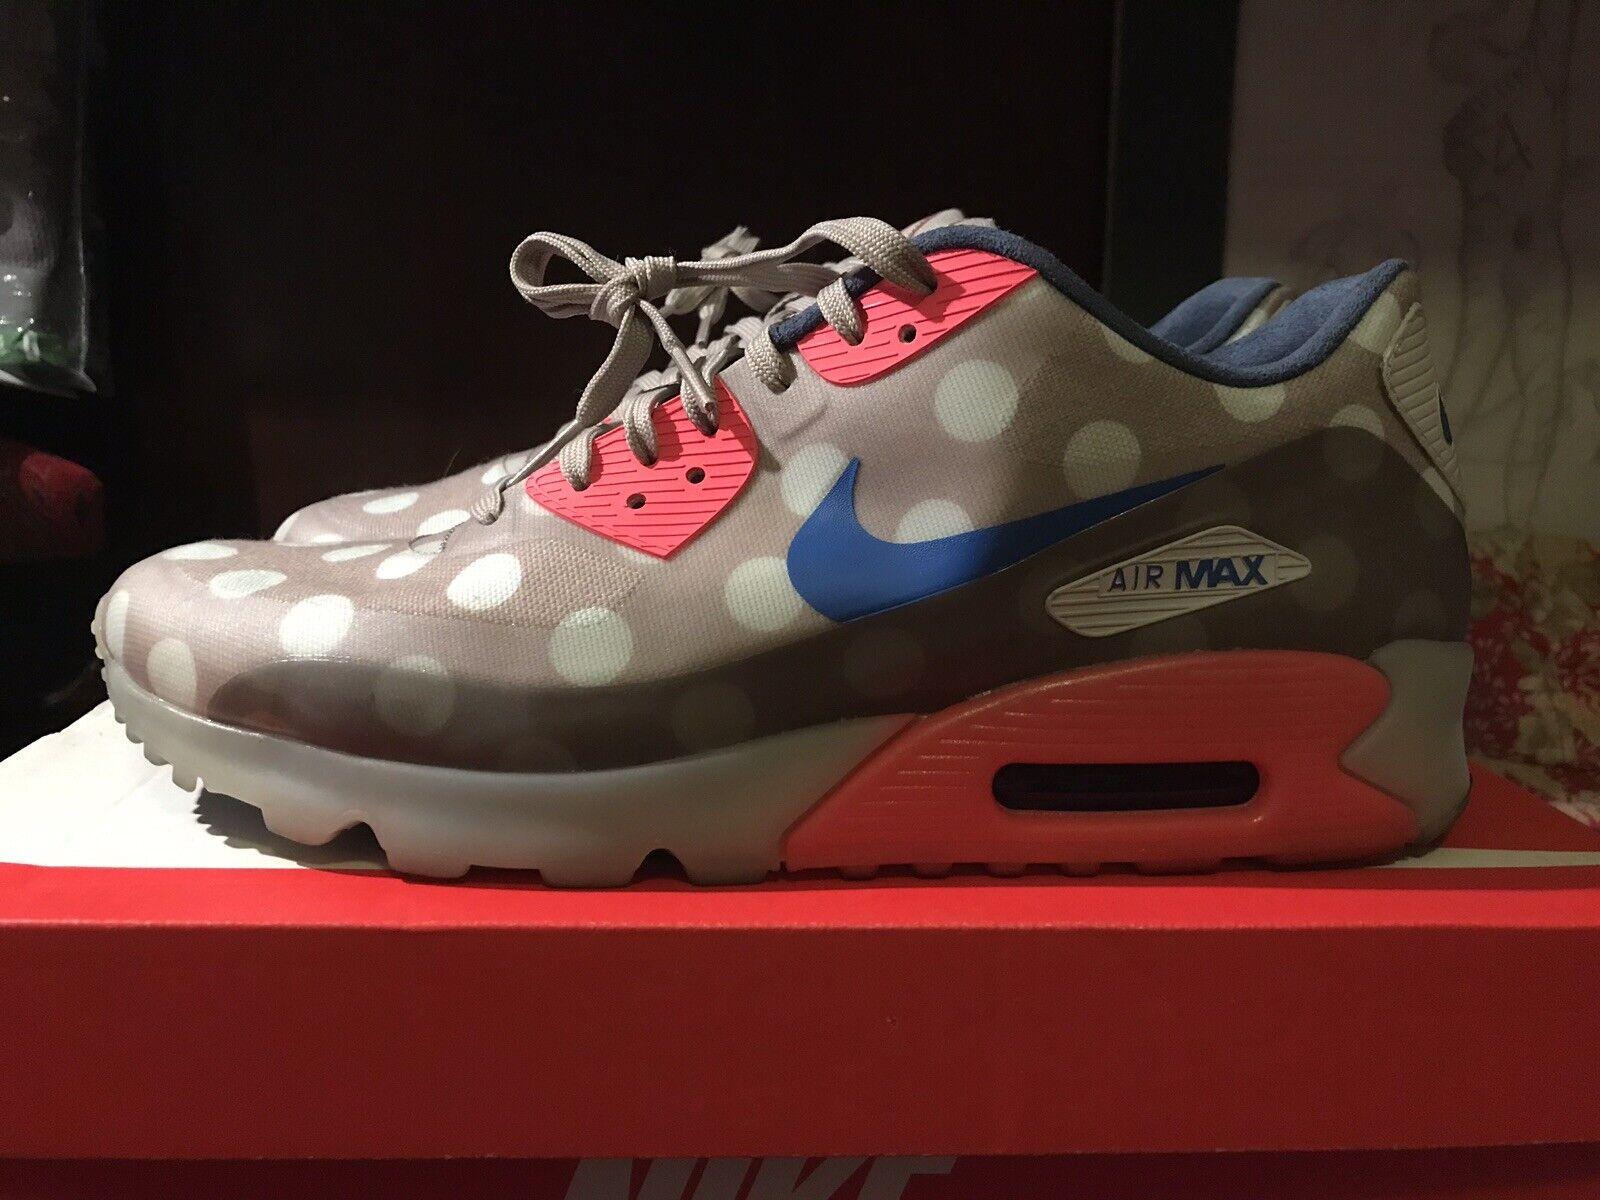 Nike Air Max 90 Ice City QS New York NYC POLKA DOT  Size 9.5 Khaki Tan Atmos